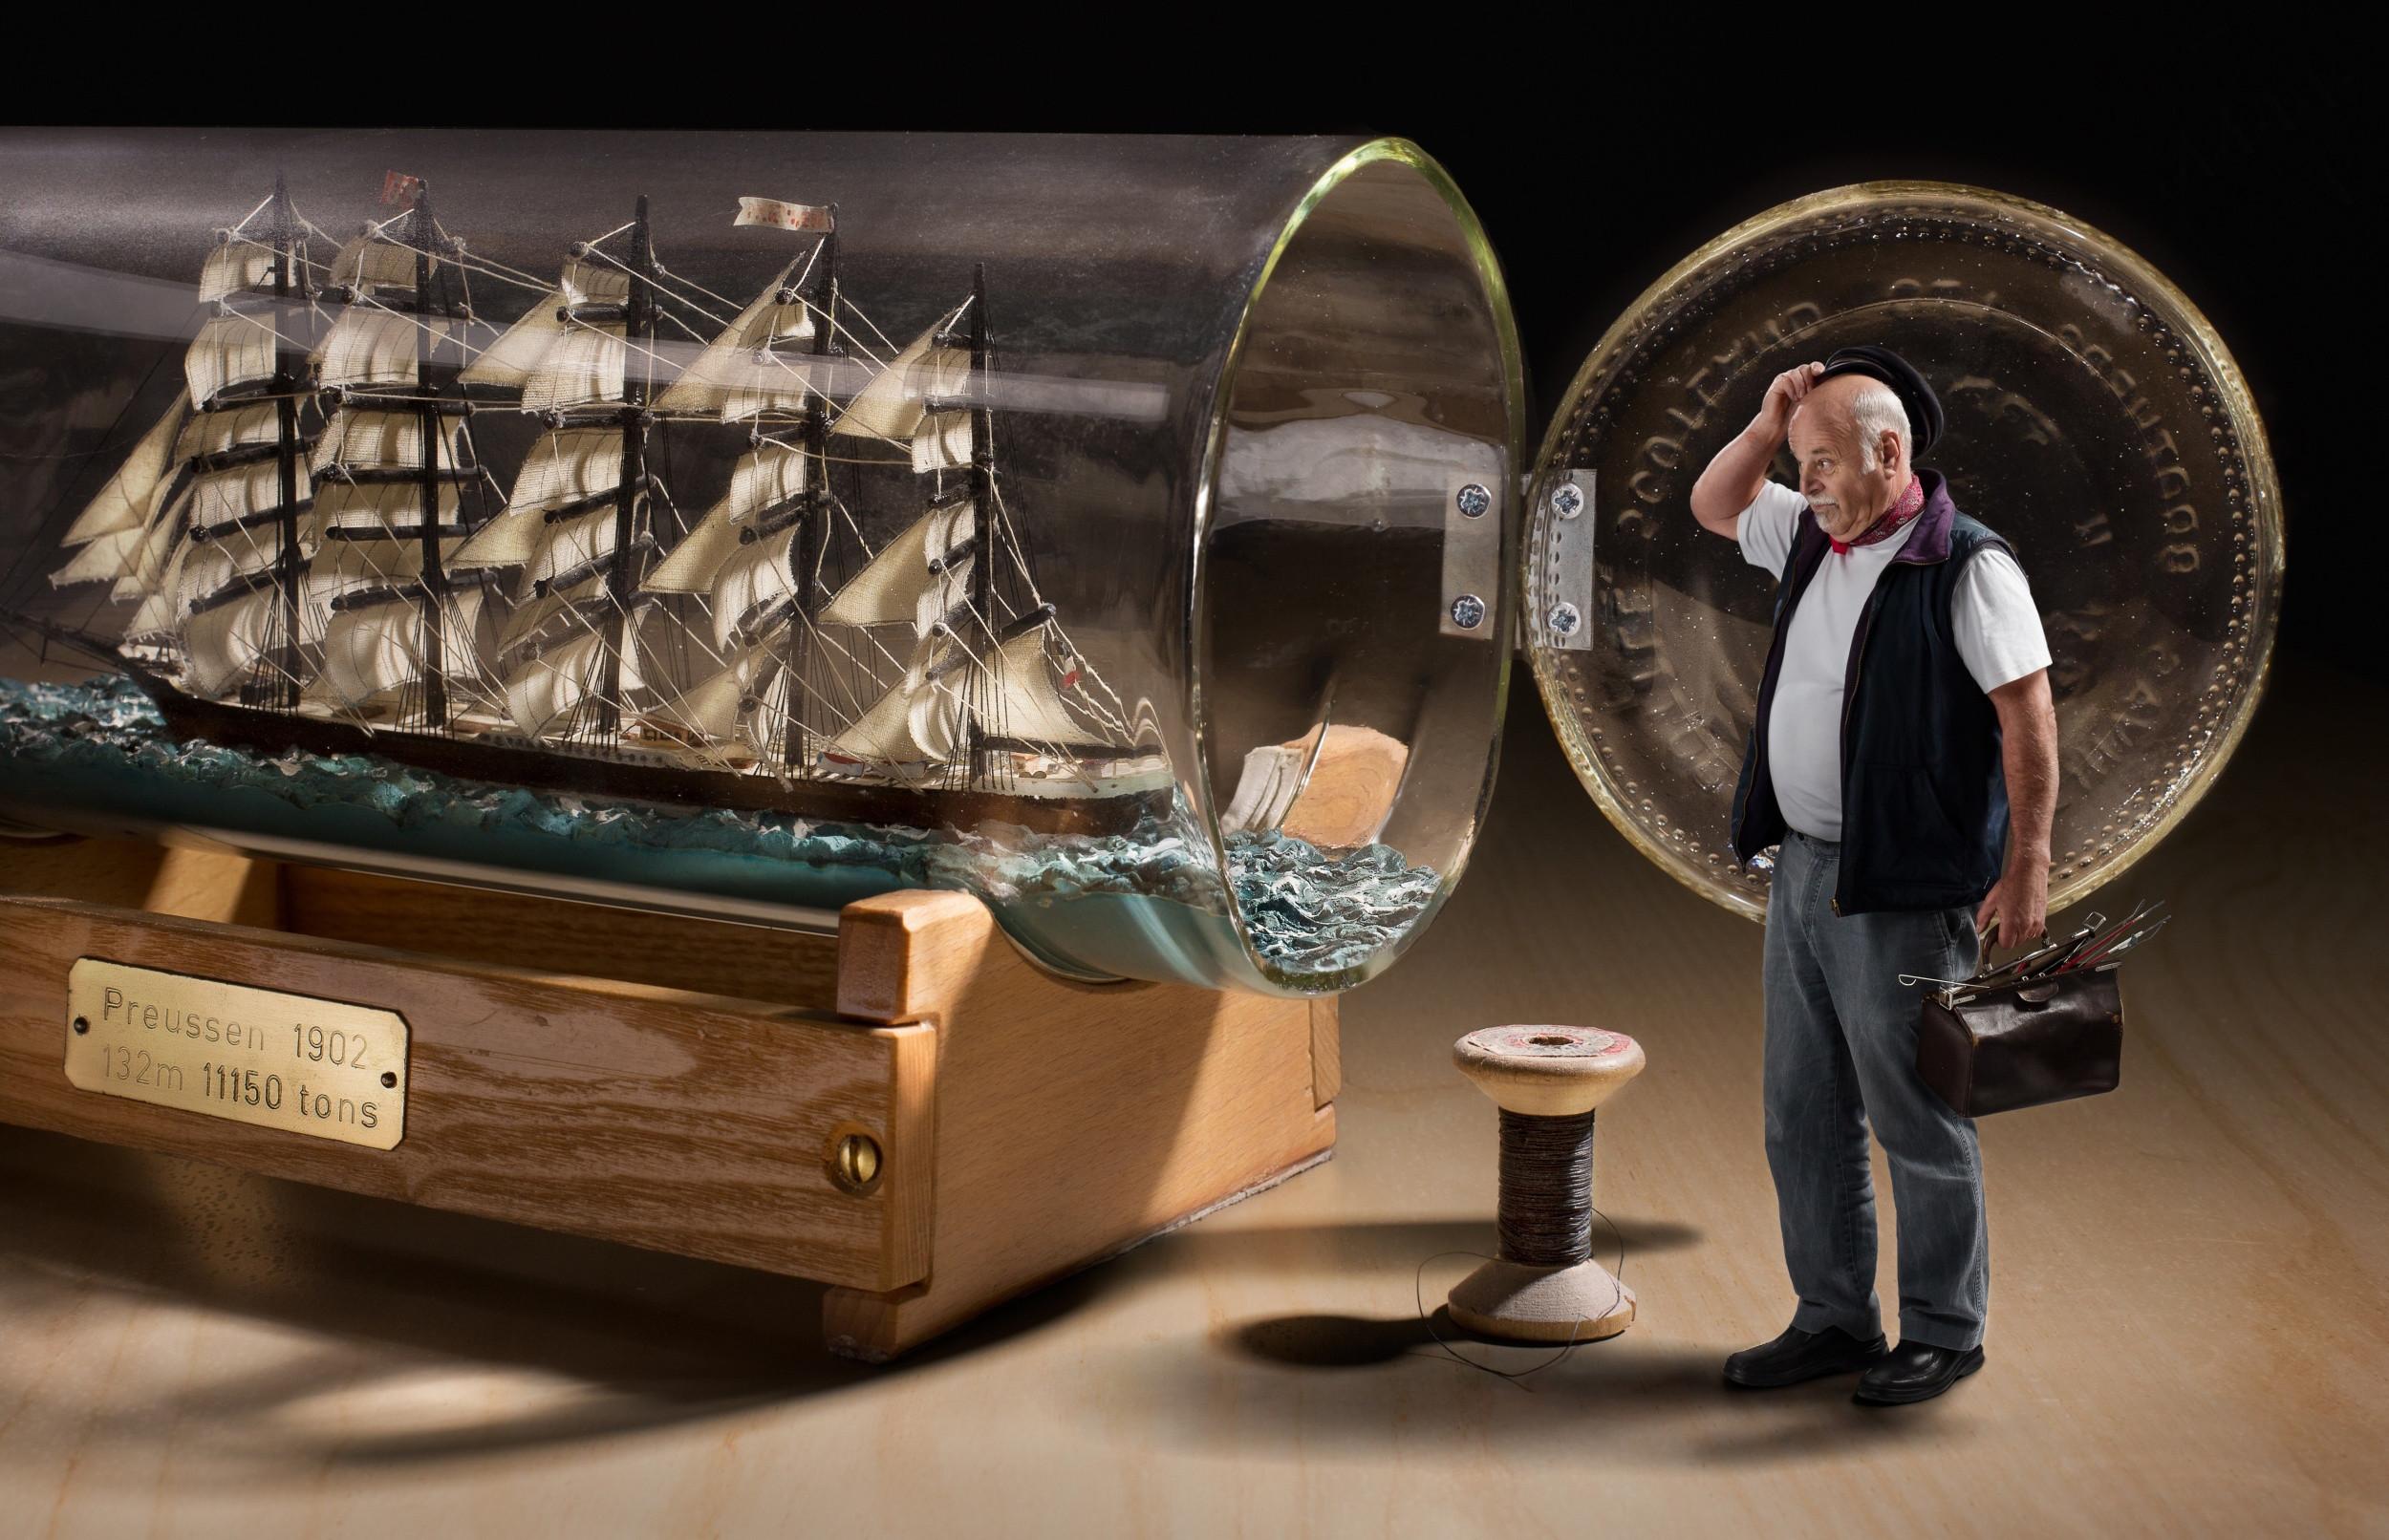 … sailboat, bottle, old man, explorers, ship, Bobbins, creative design,